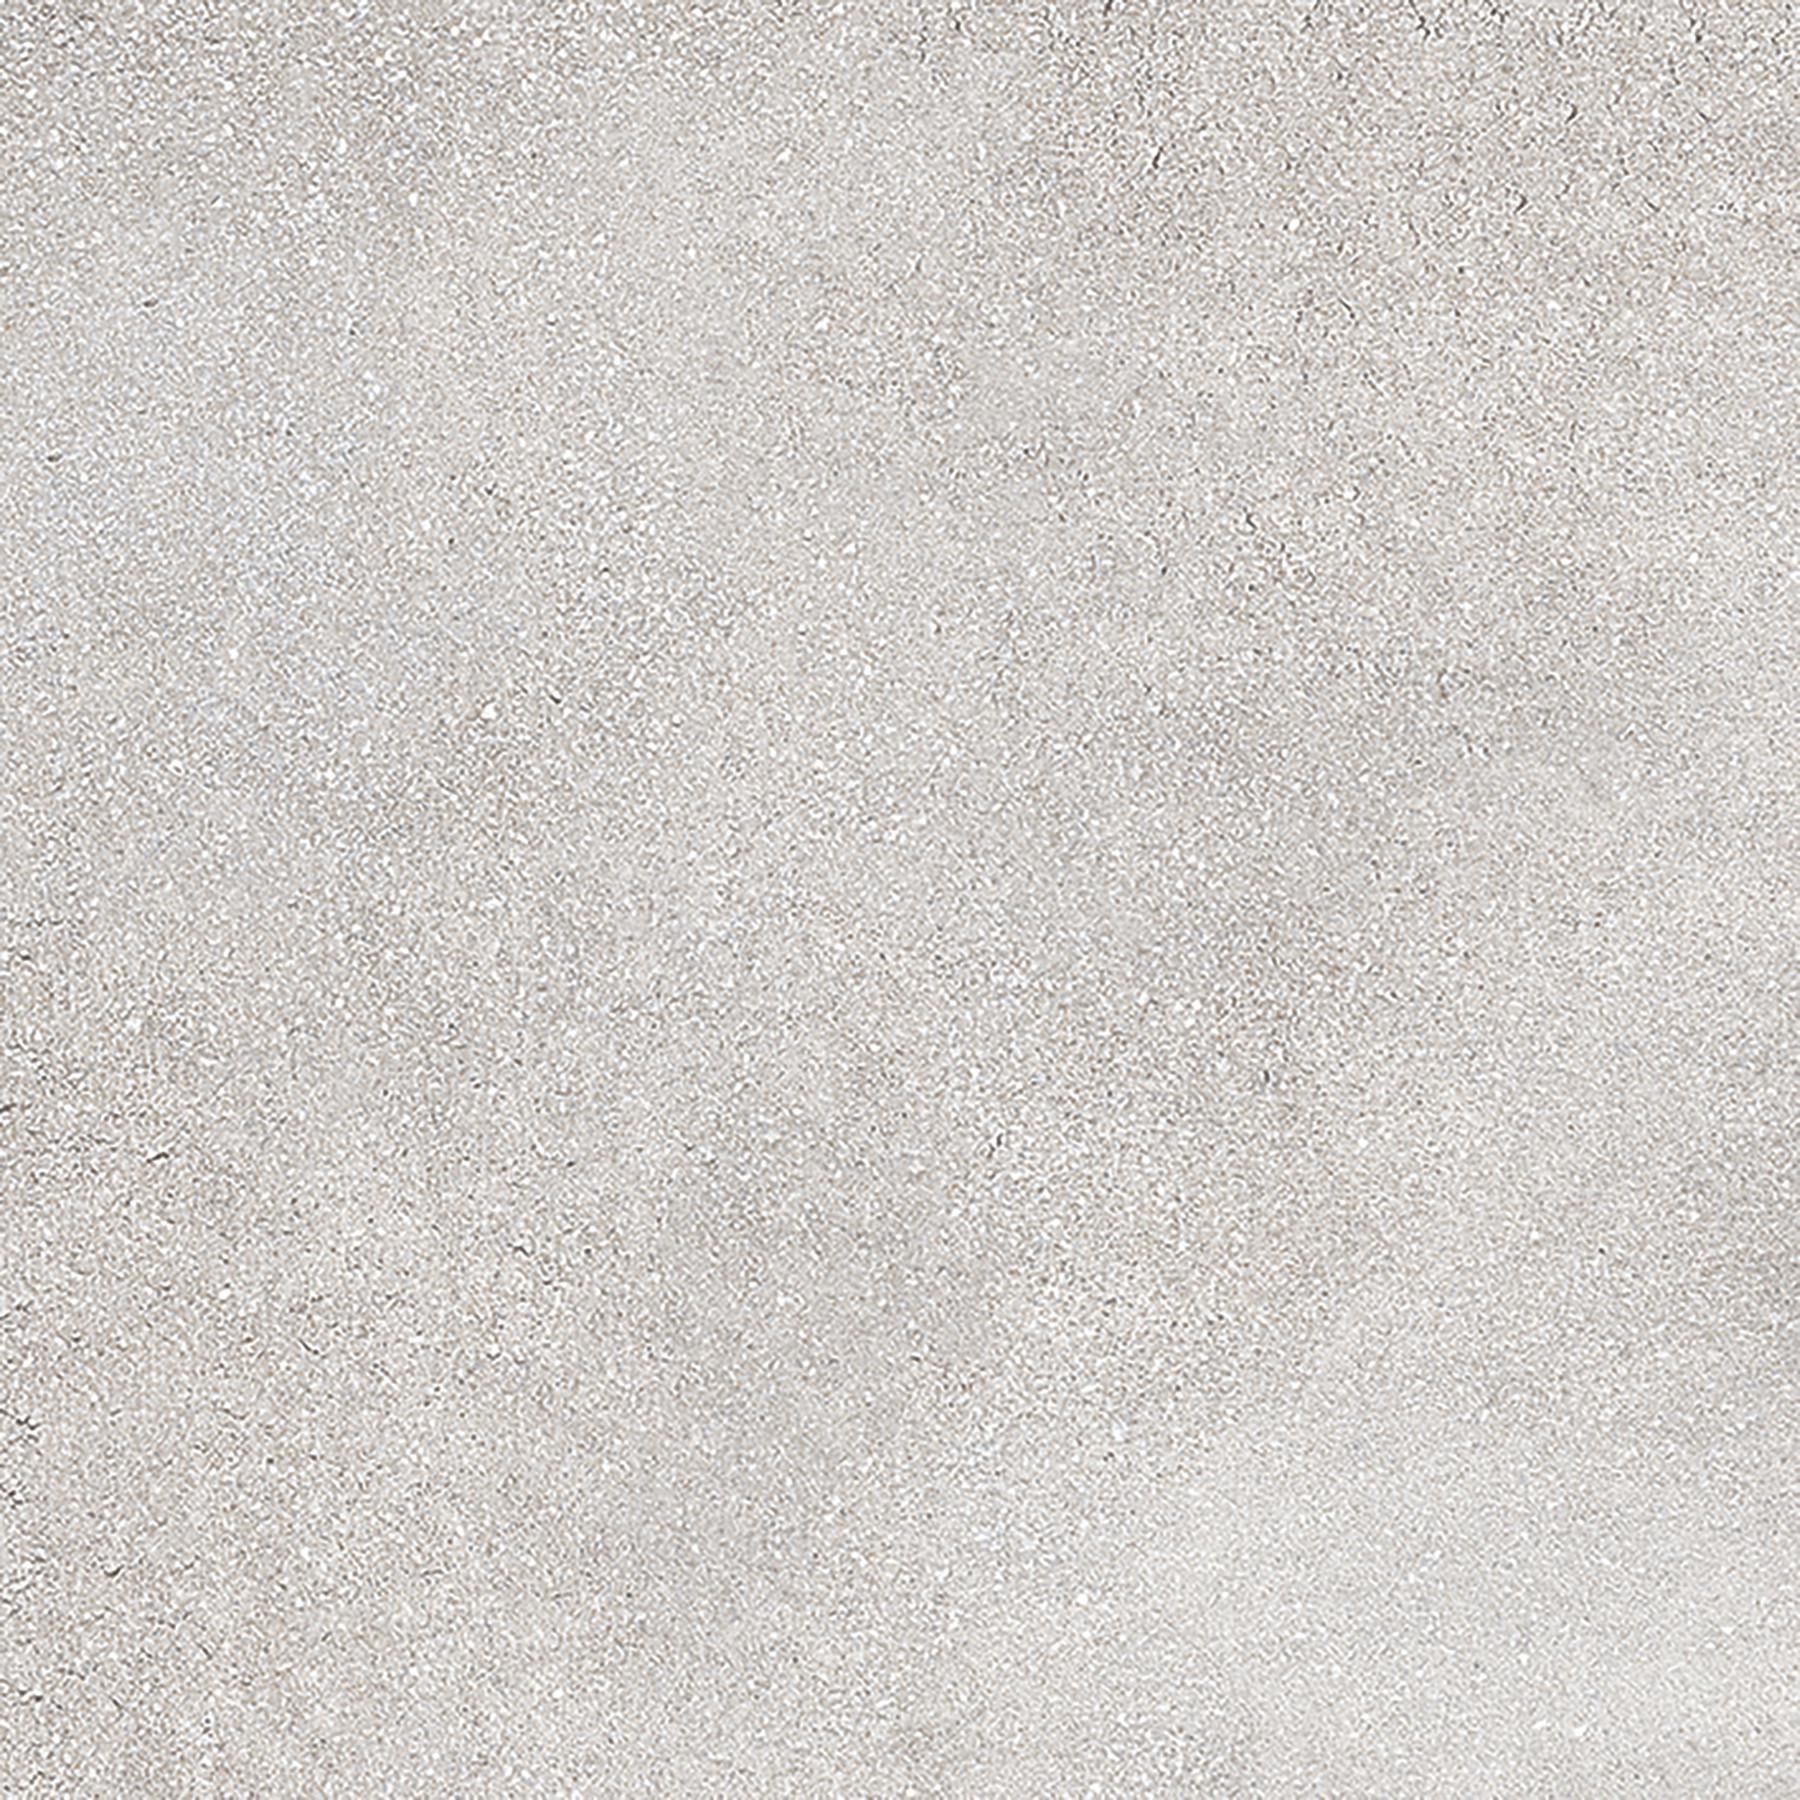 EMPOLI 20x20 Gray Fon